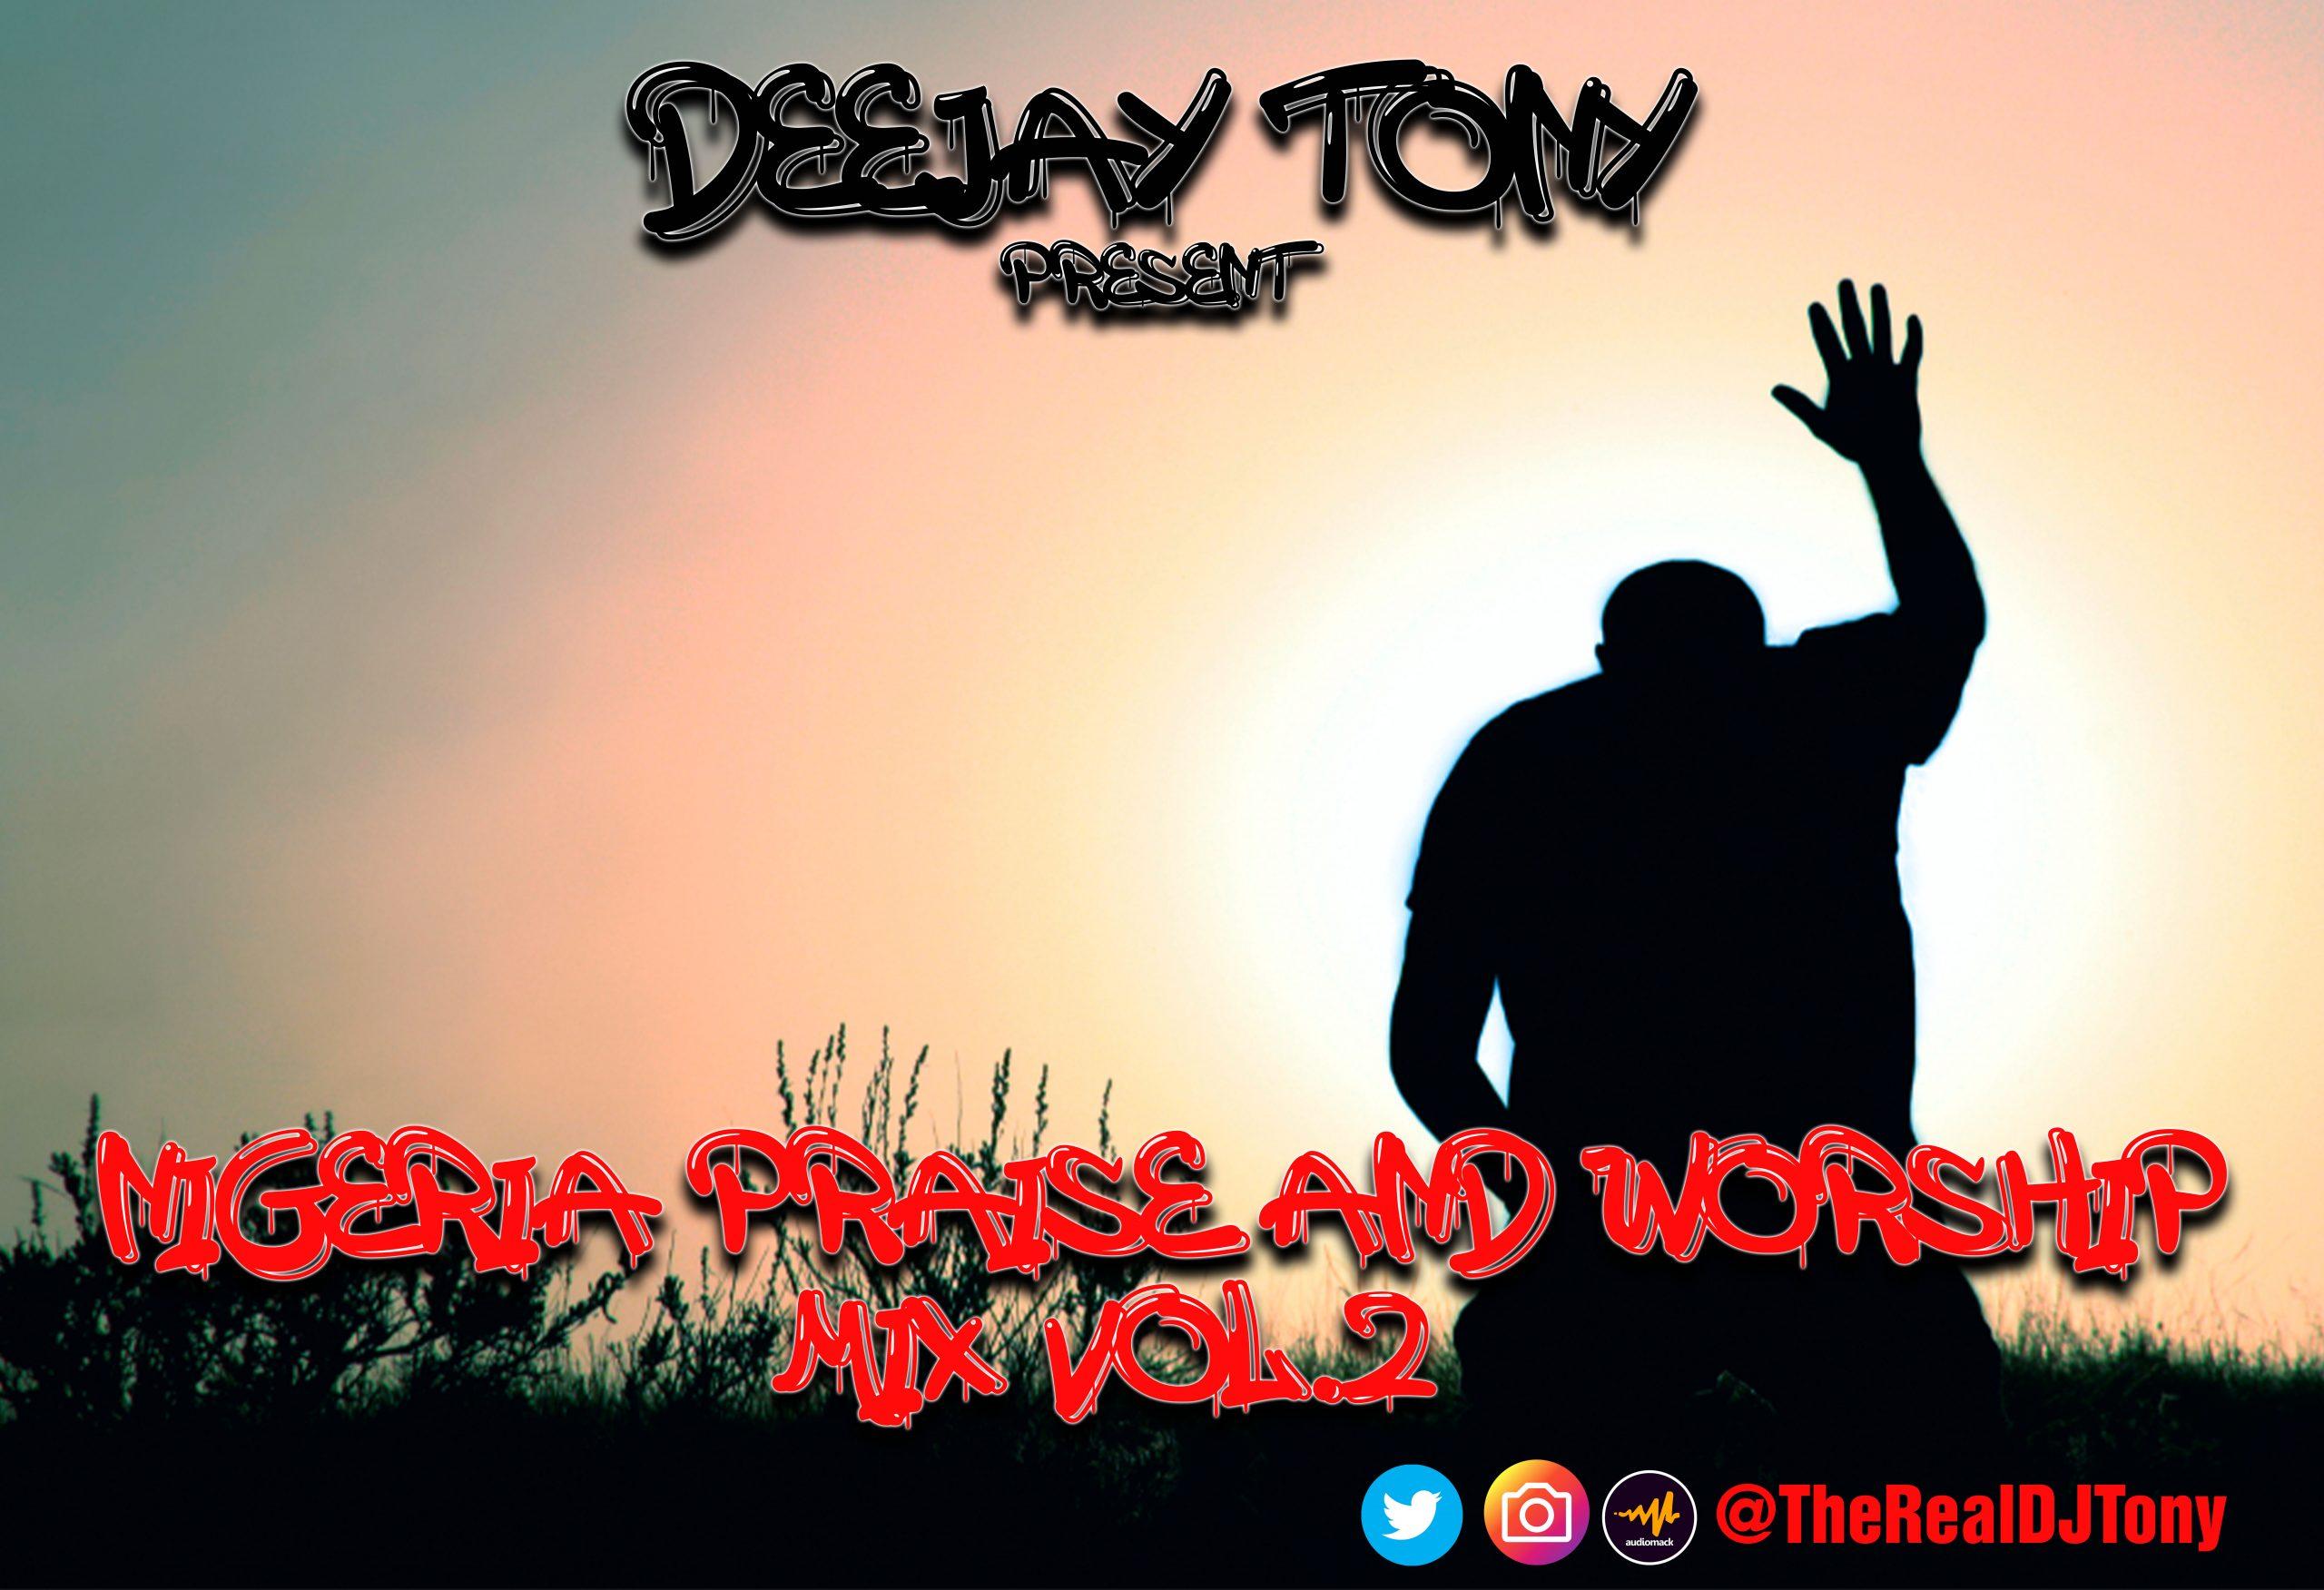 Mixtape: Dj Tony - Nigeria Praise and worship Mix Vol.2